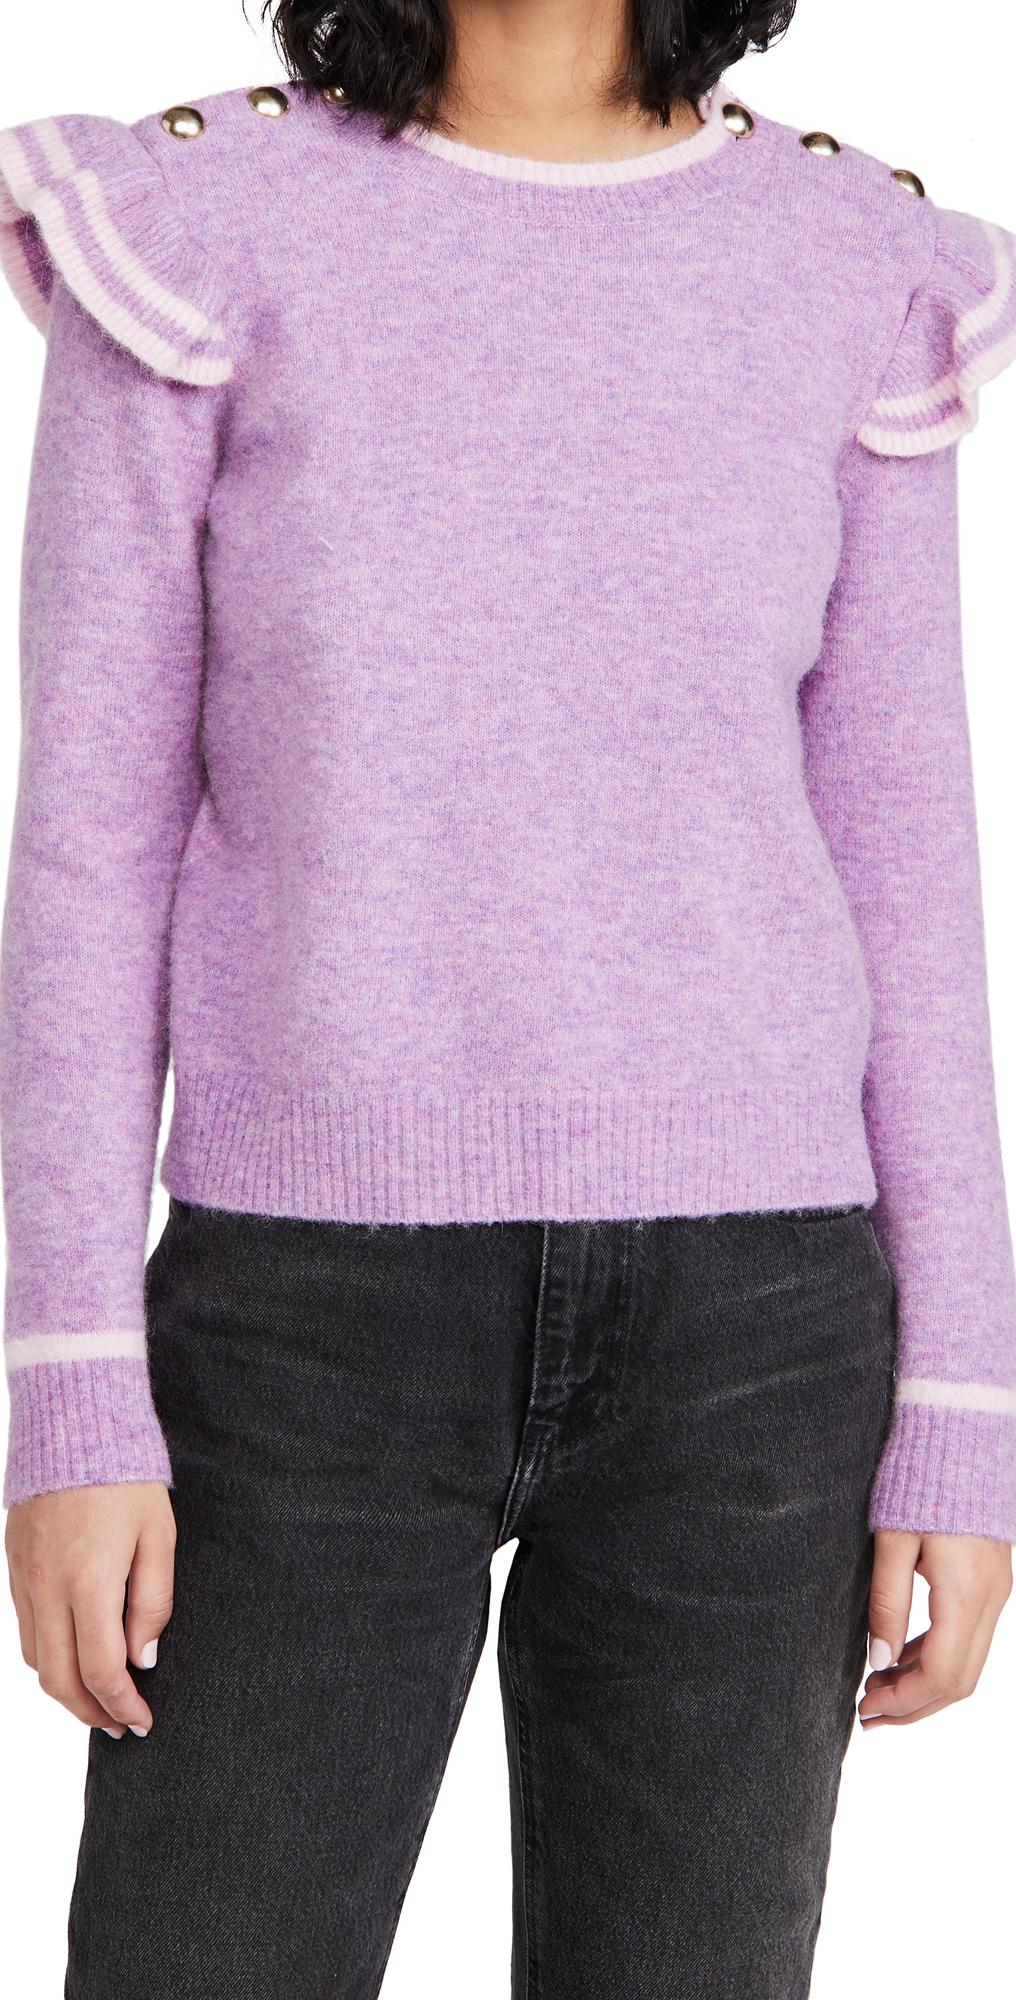 Generation Love Brynlee Sweater